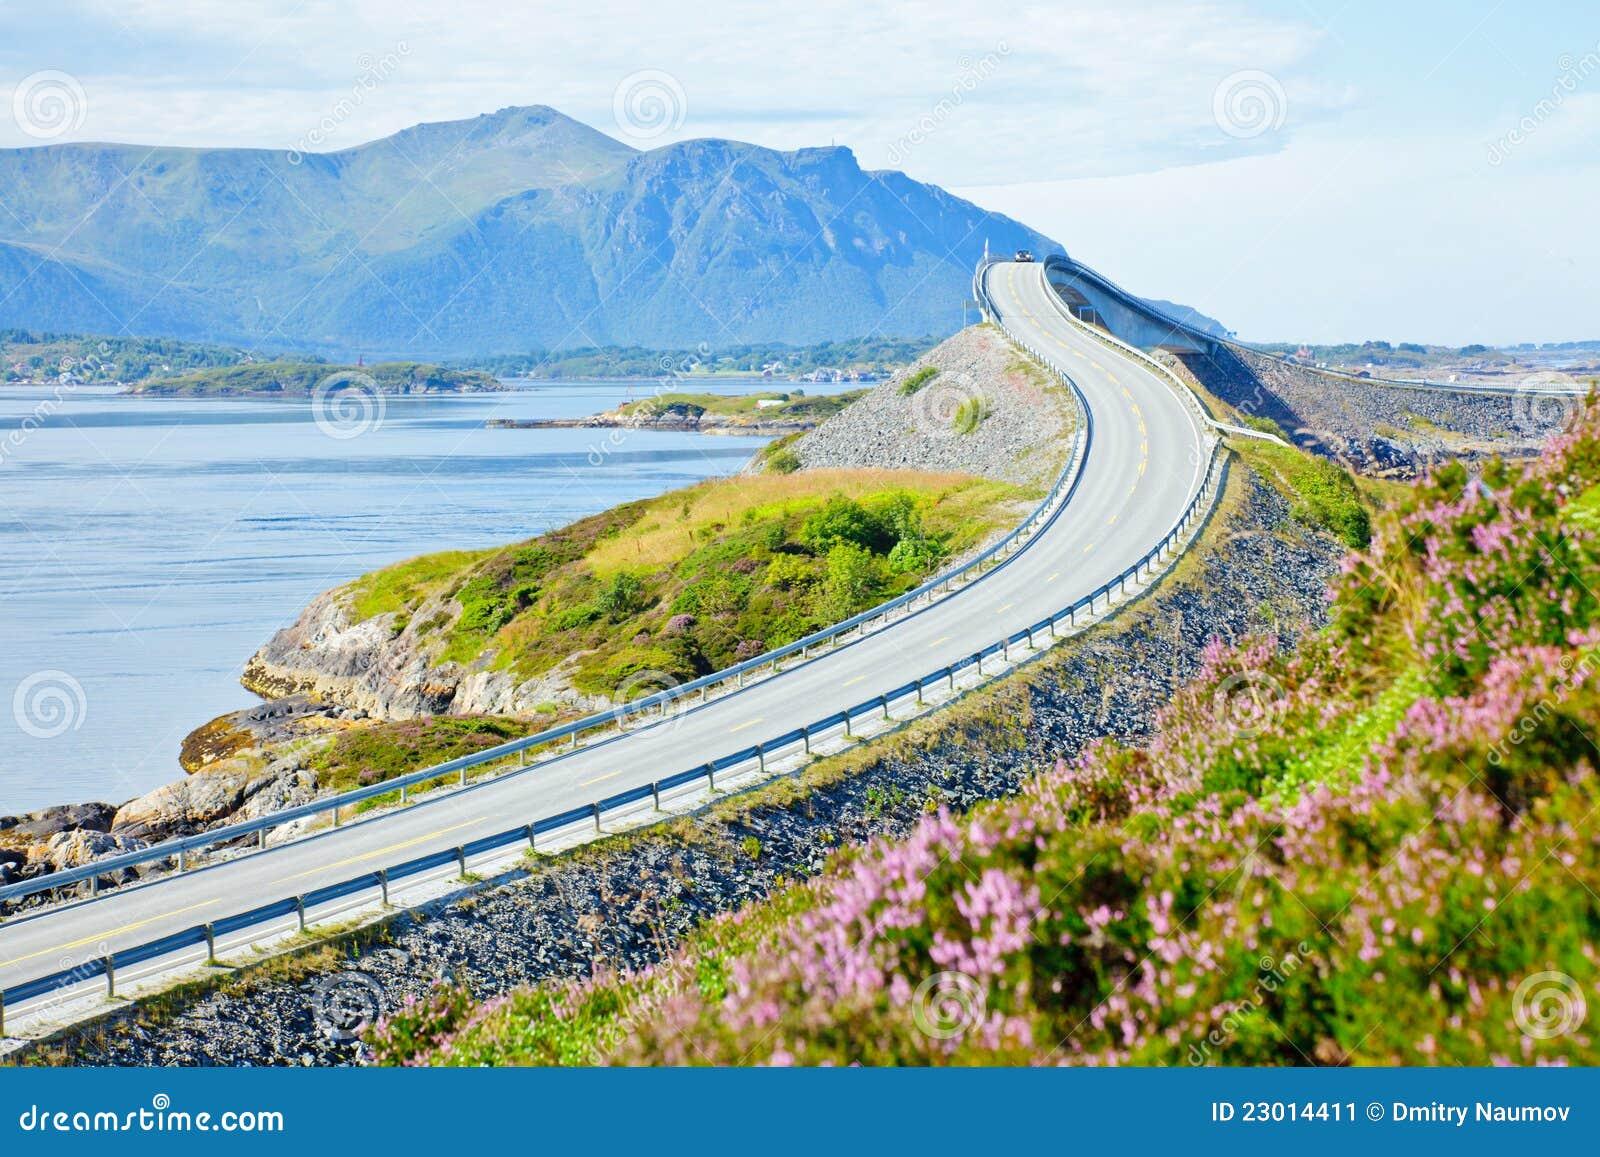 Download Scenic ocean road stock image. Image of lane, popular - 23014411